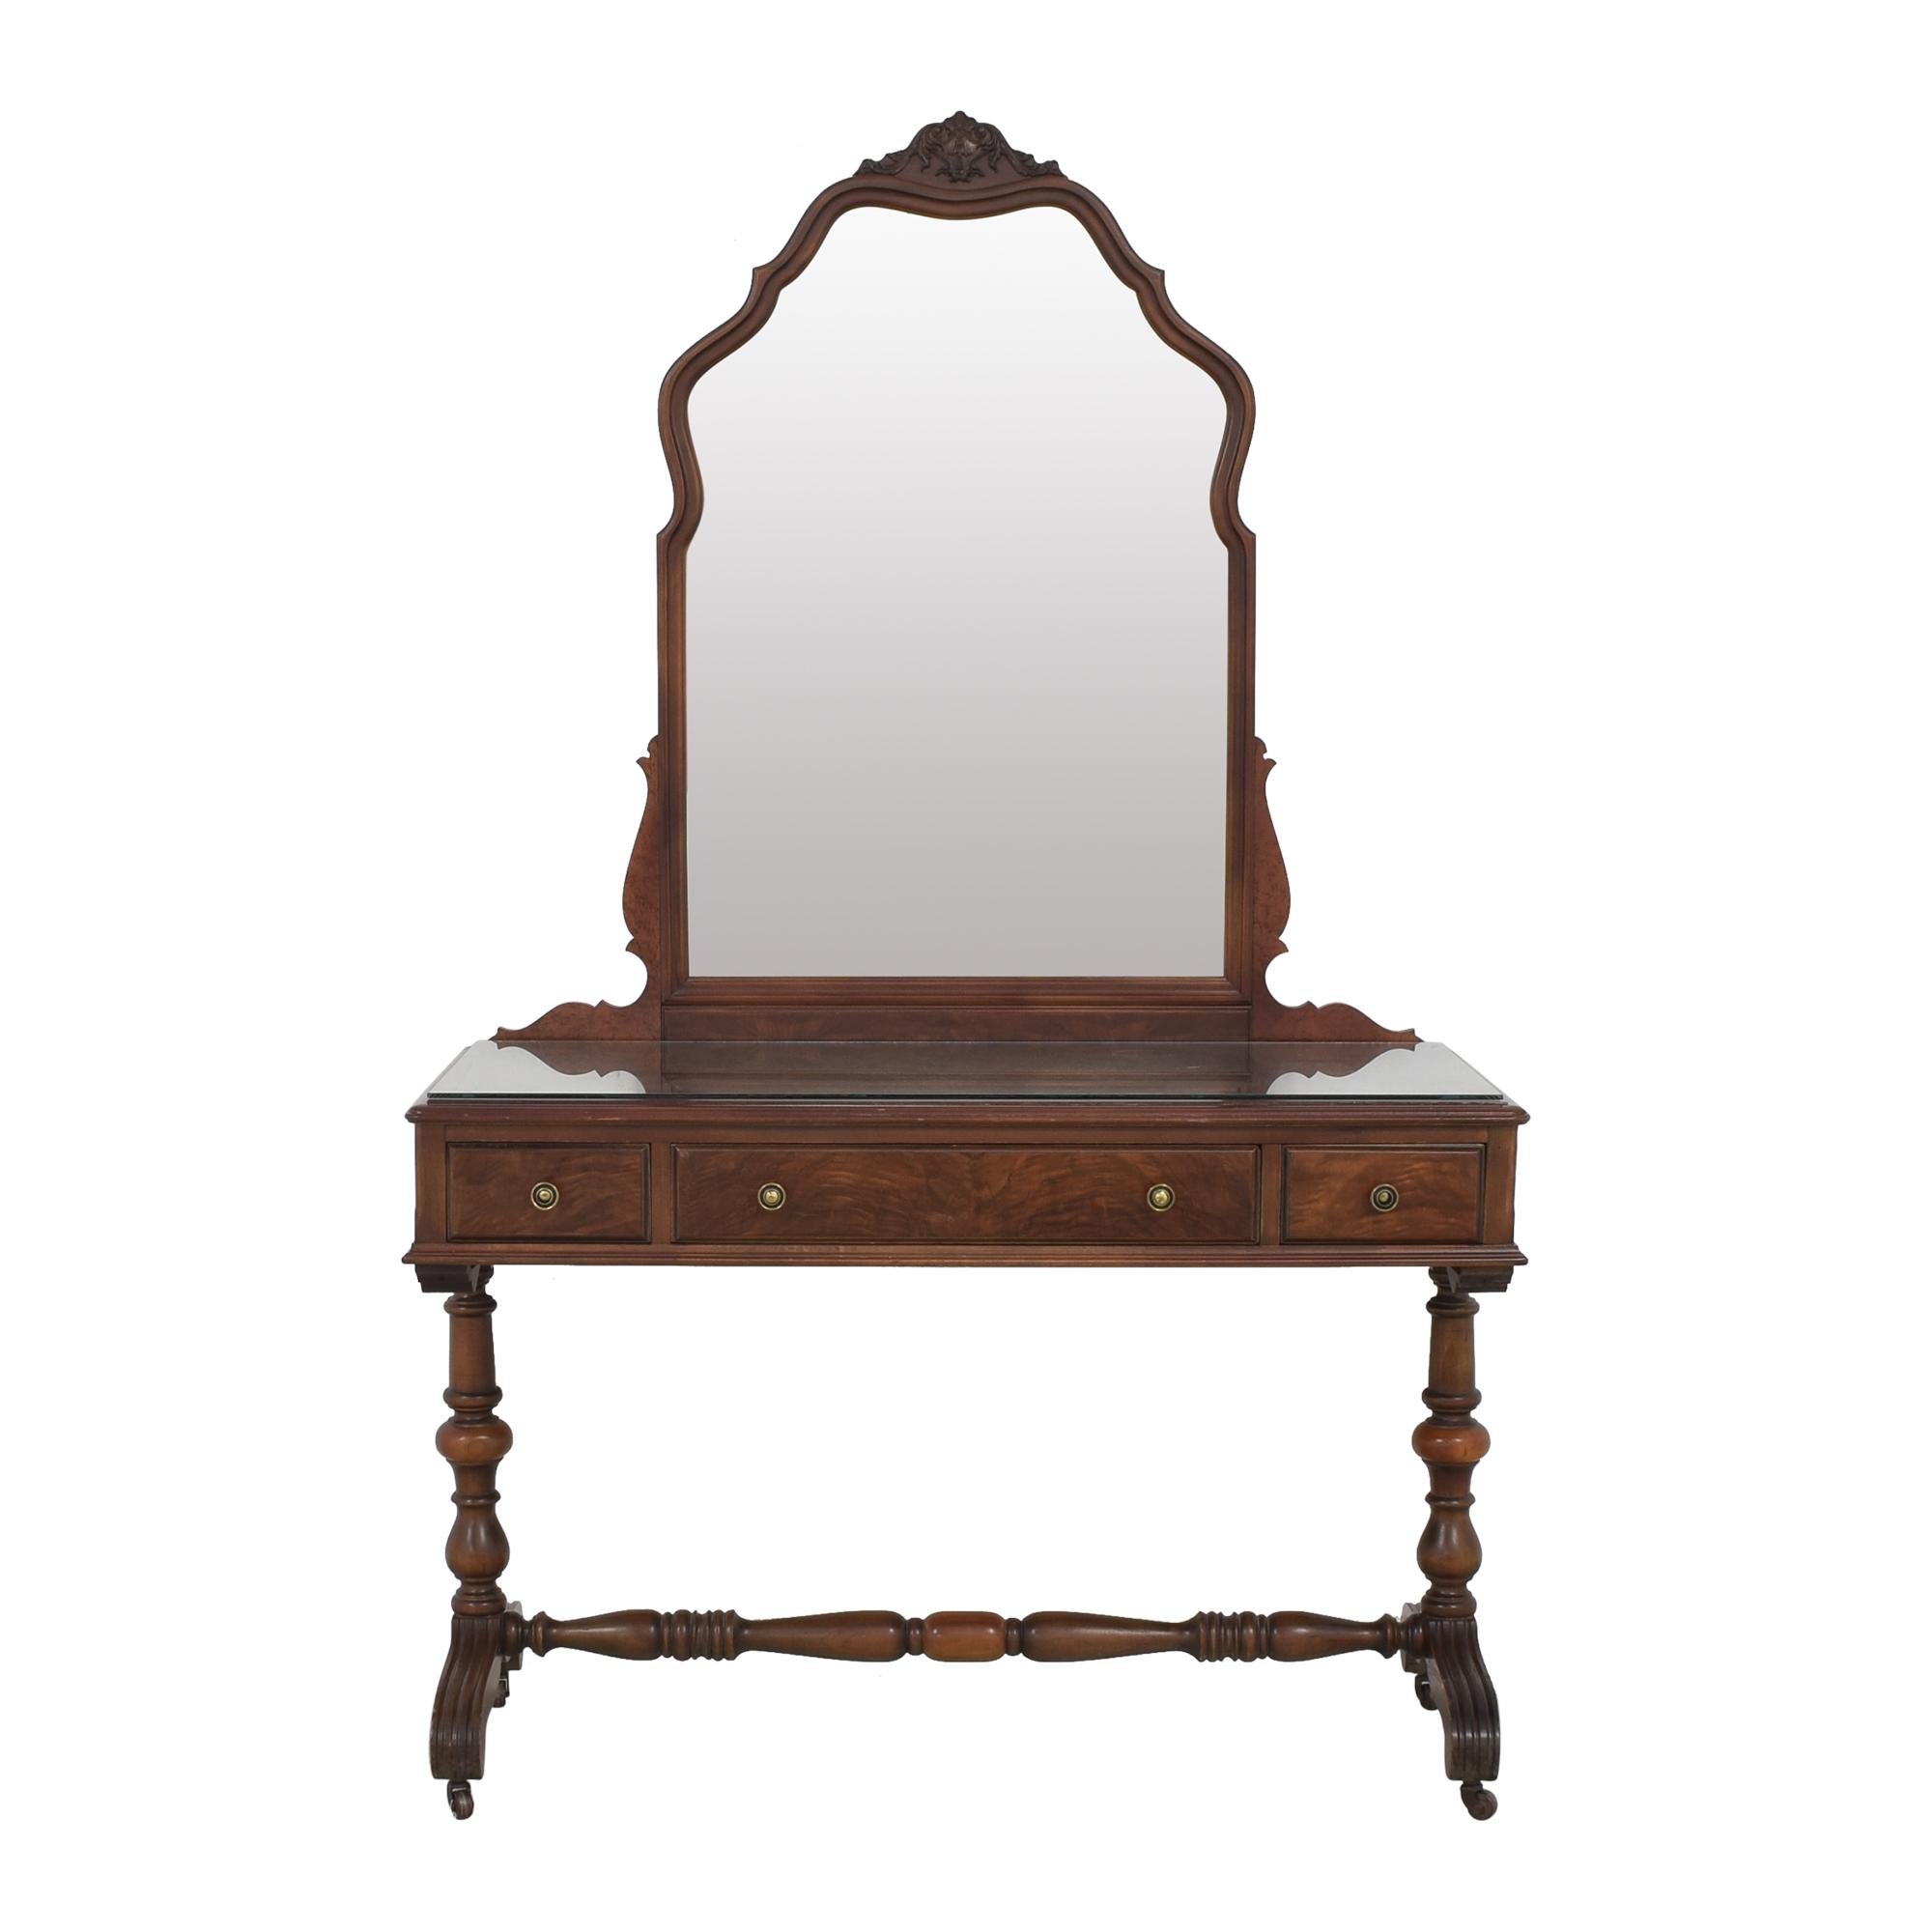 buy Rishel Company Vanity with Removable Mirror Rishel Company Home Office Desks